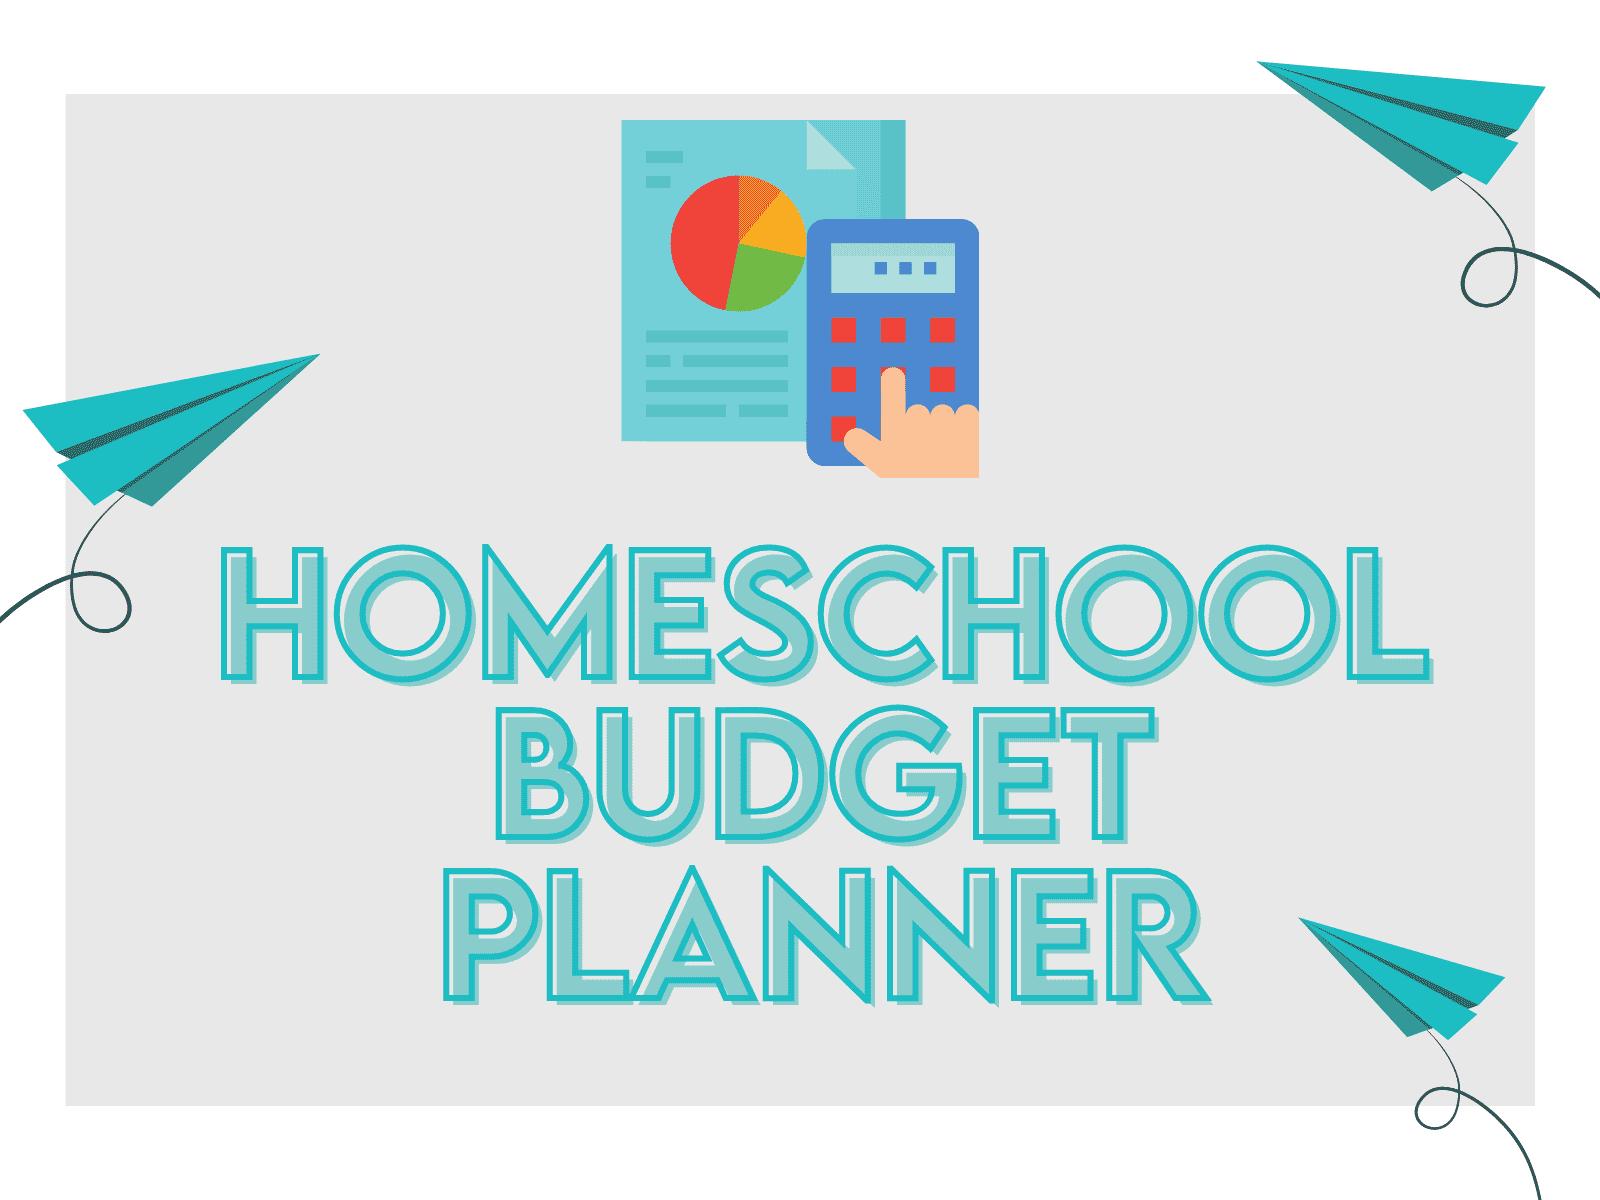 Homeschool budget planner for parents, educators, and teachers.